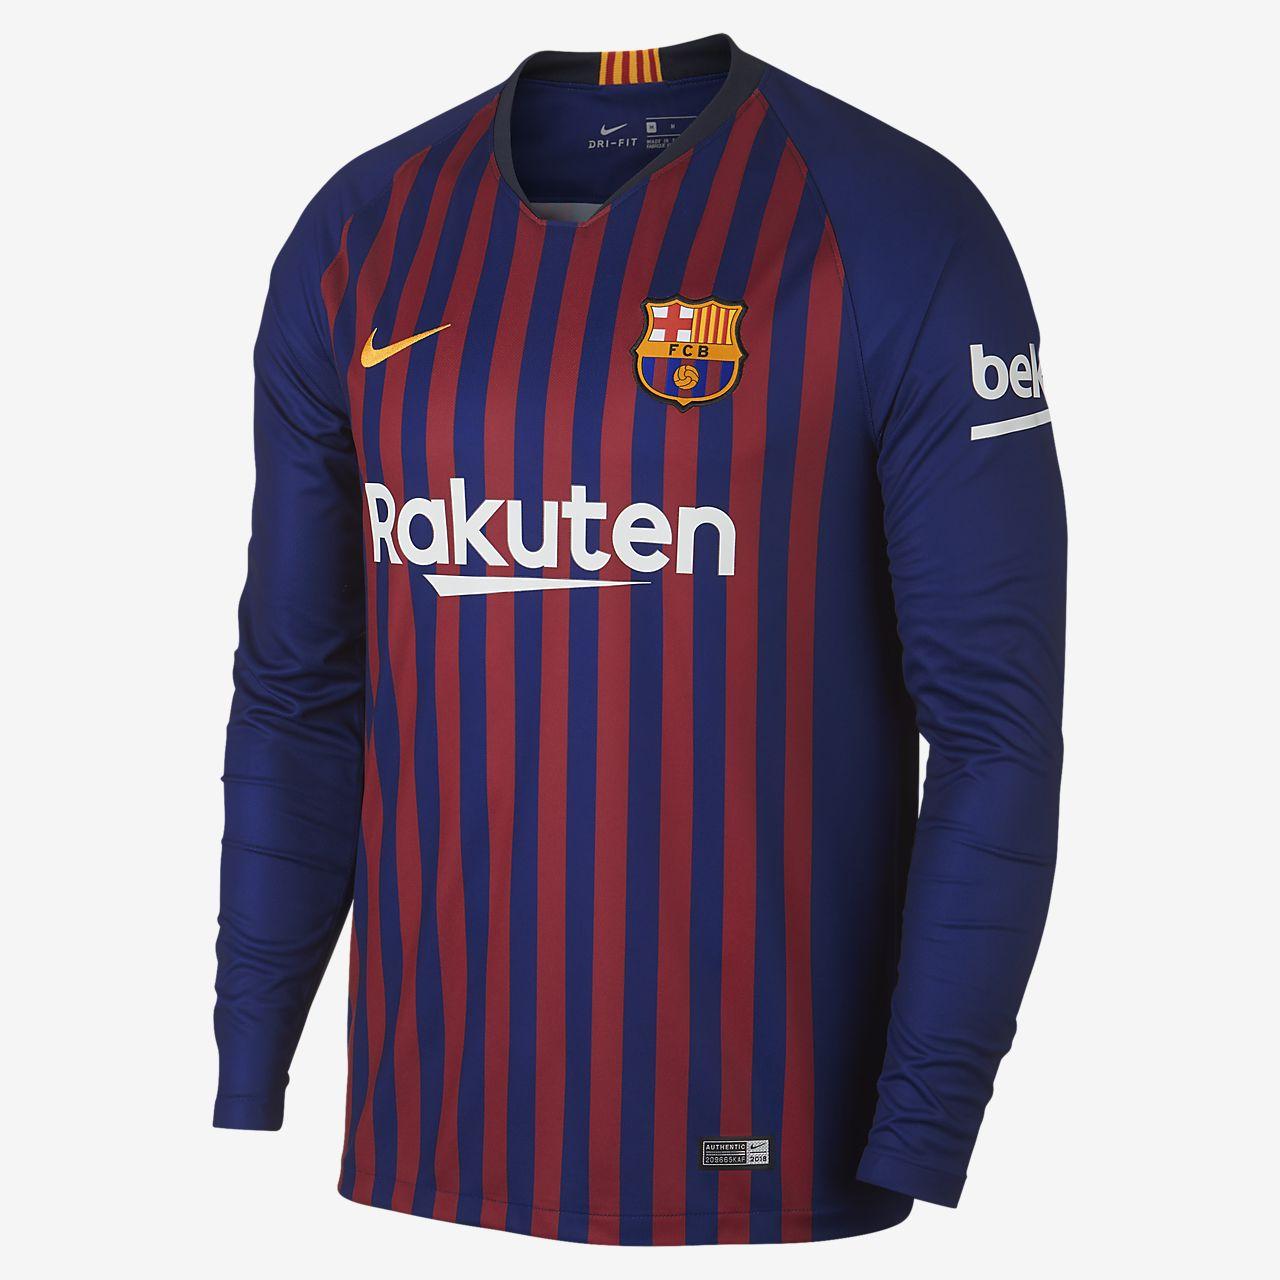 3e1f19e93f8 2018/19 FC Barcelona Stadium Home Men's Long-Sleeve Football Shirt ...